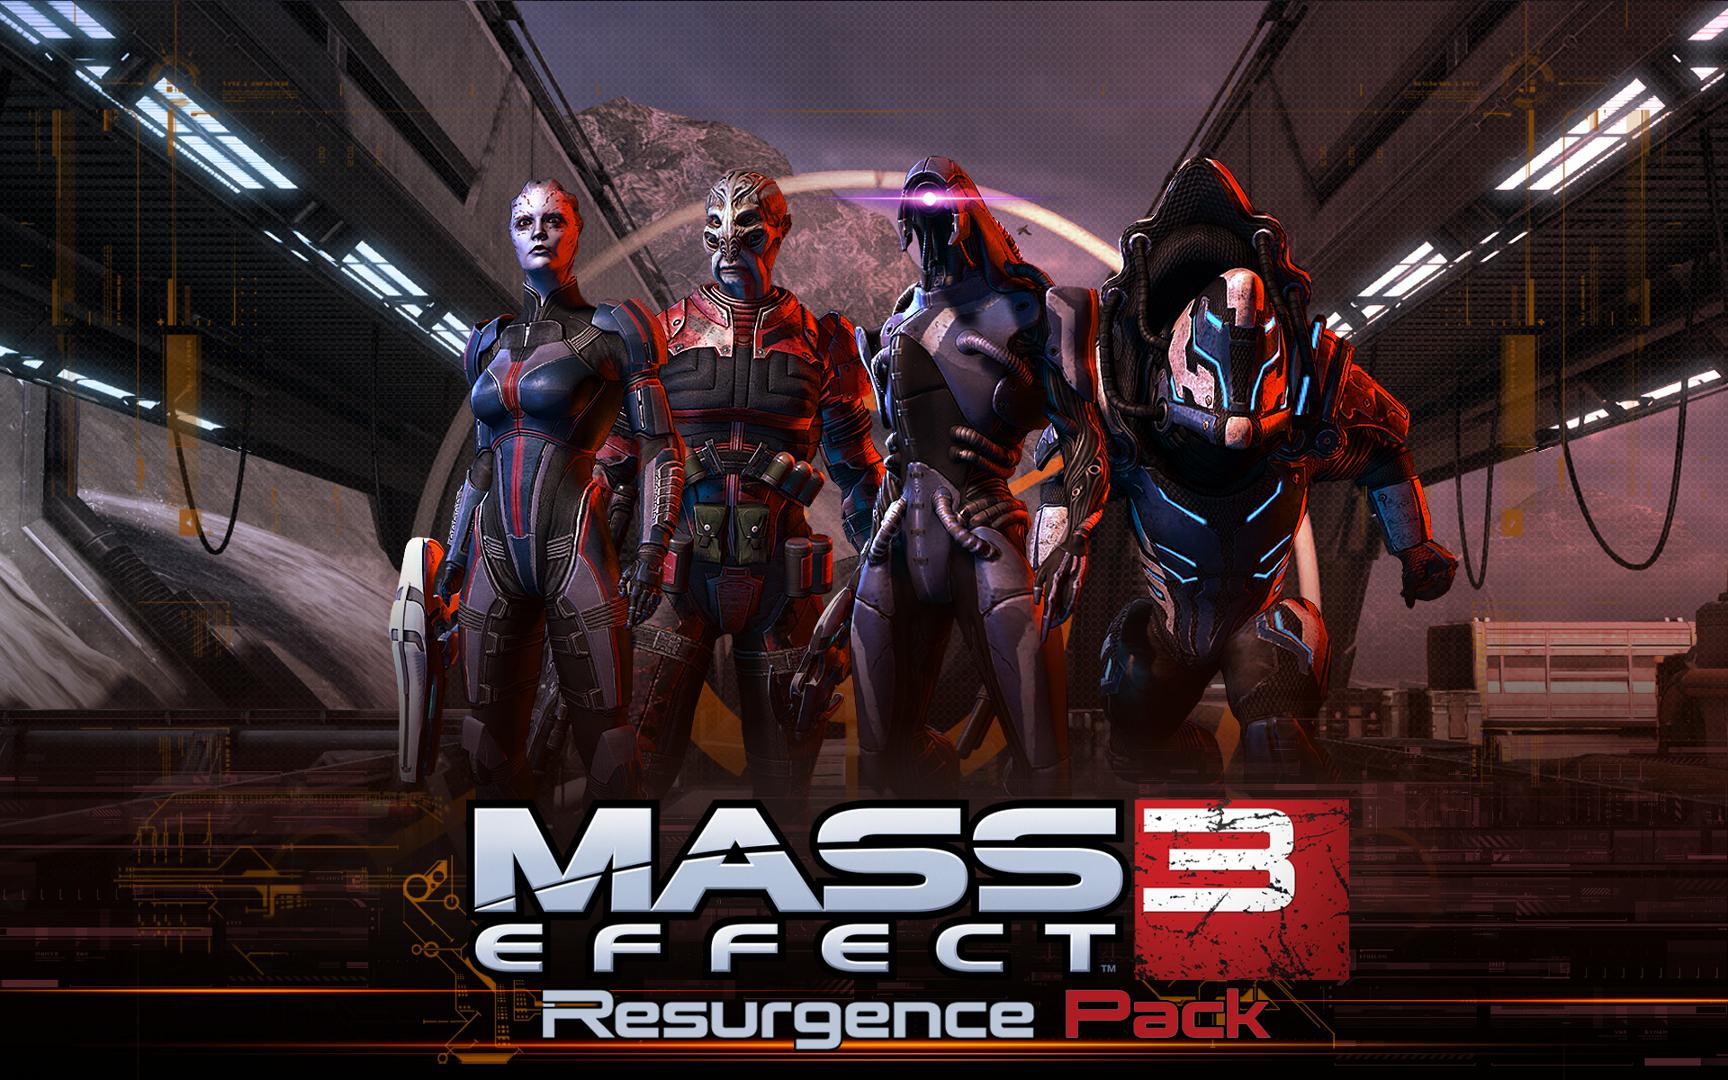 Ya puedes bajar el DLC Resurgence para Mass Effect 3 [Free DLC]